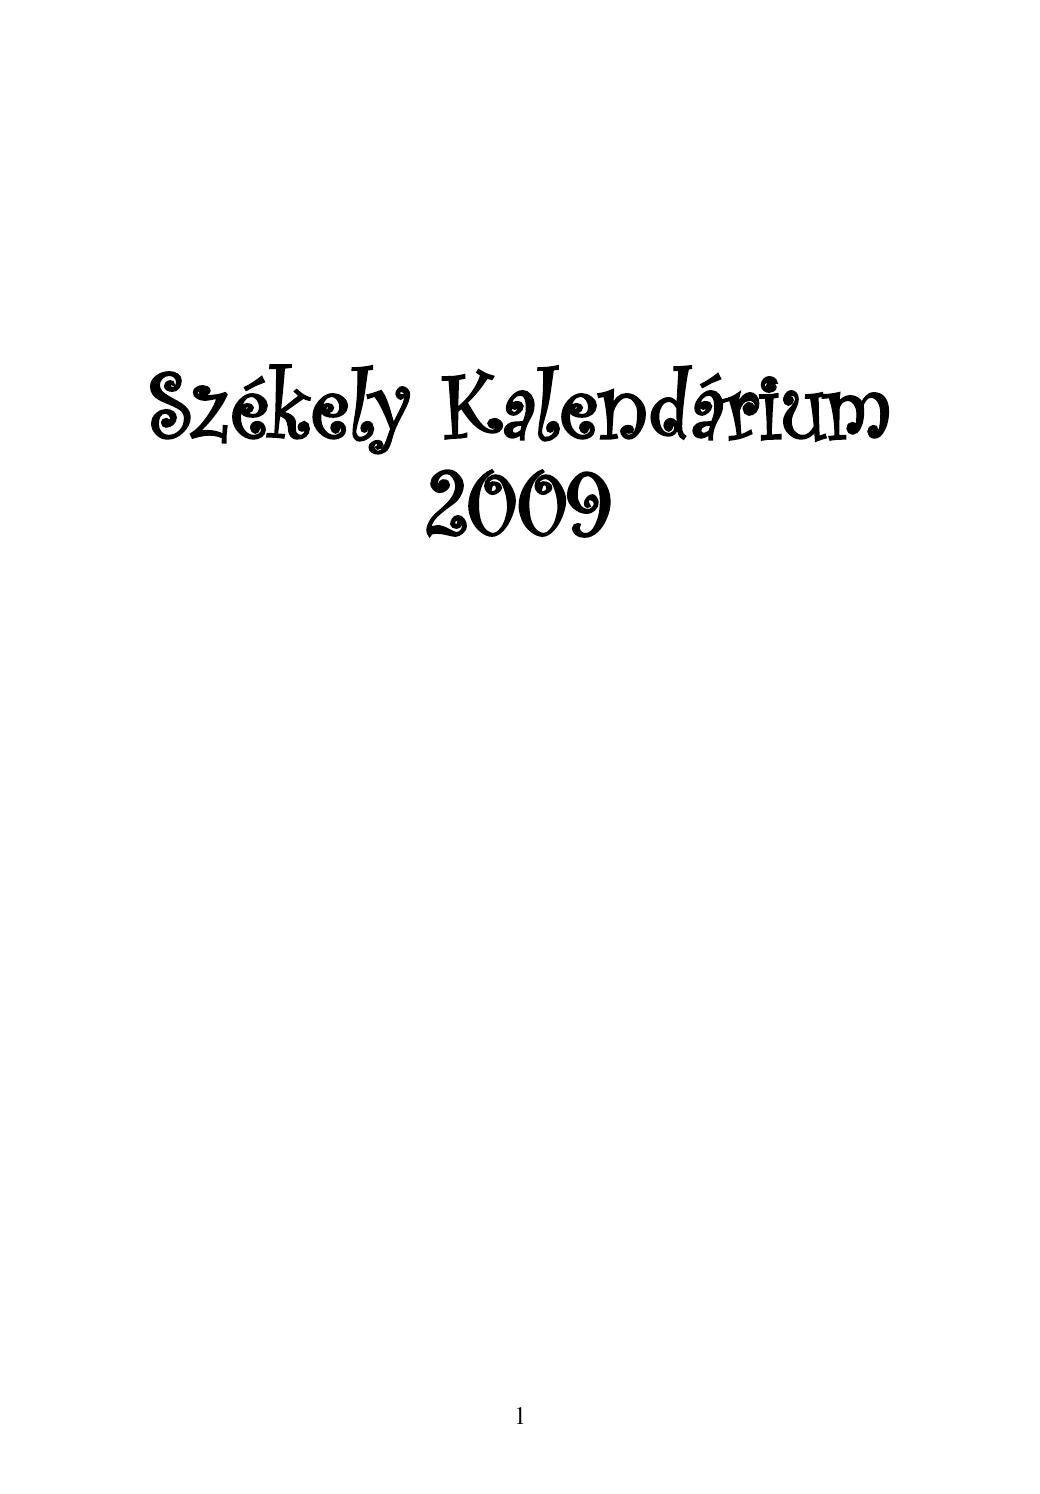 tonic clonic seizure - Magyar fordítás – Linguee